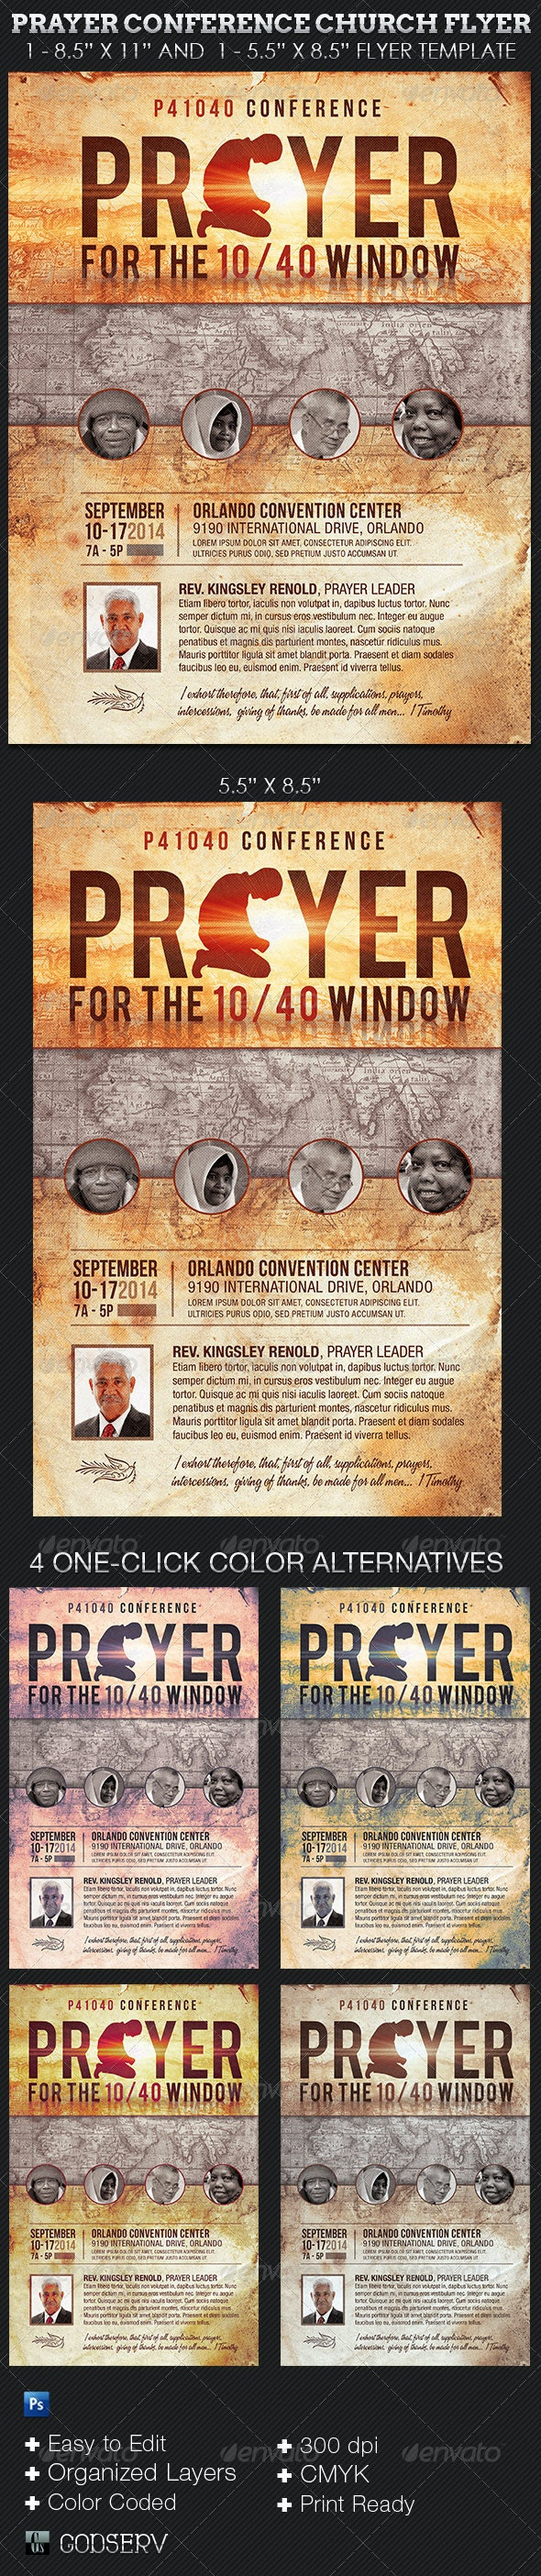 Prayer Conference Church Flyer Template - Church Flyers